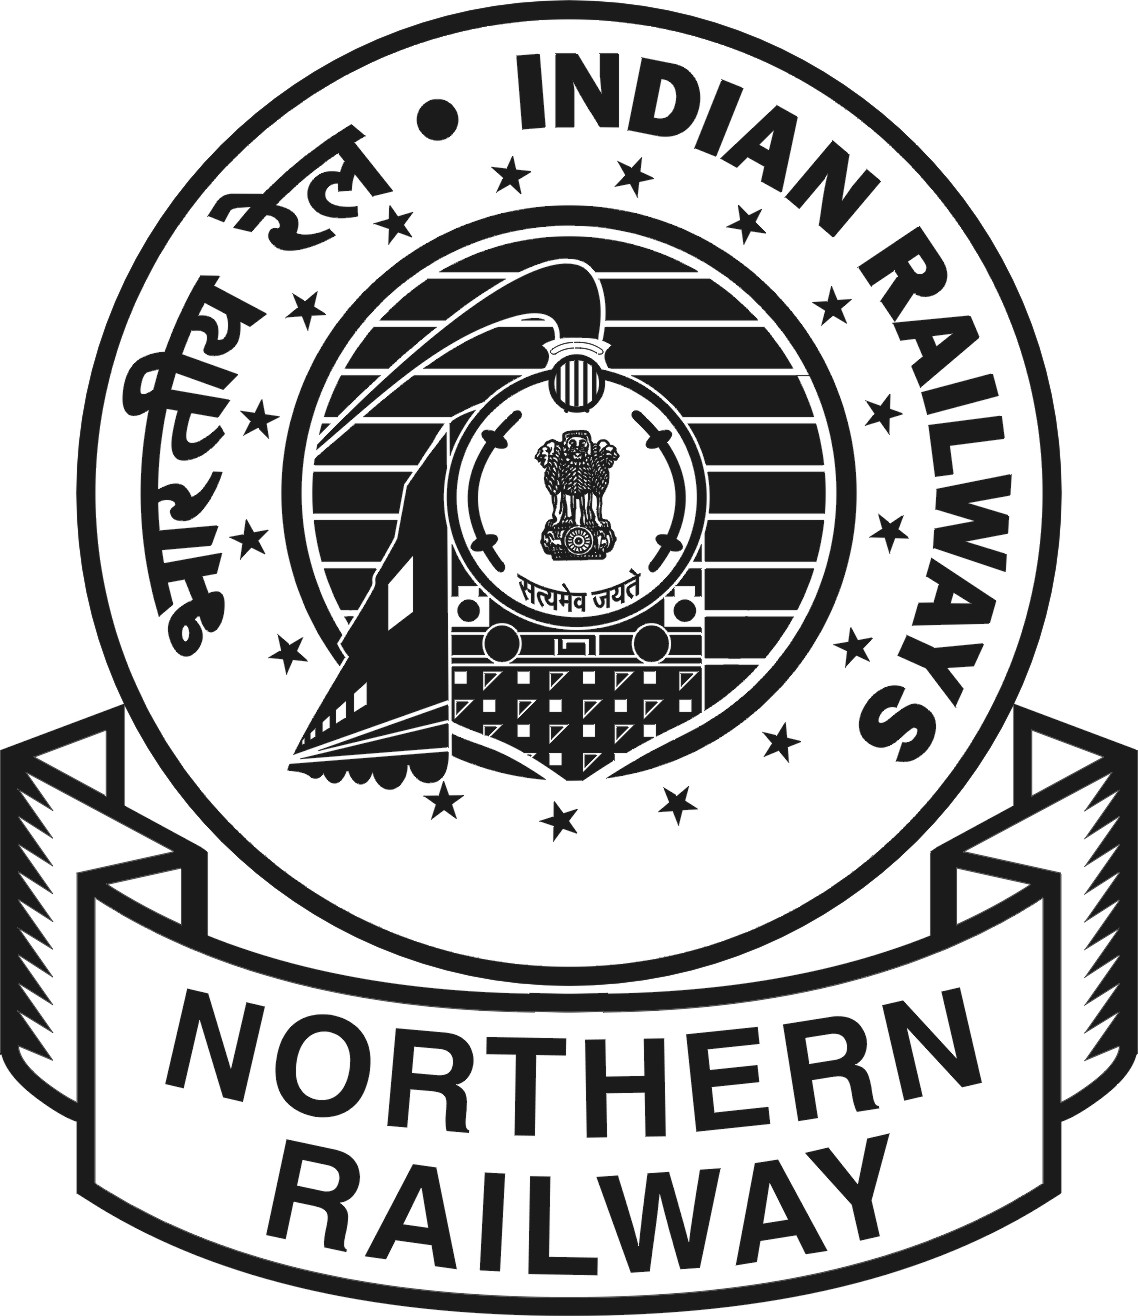 Northern railway latest recruitment of 11 vacancies govt jobs northern railway latest recruitment of 11 vacancies biocorpaavc Gallery